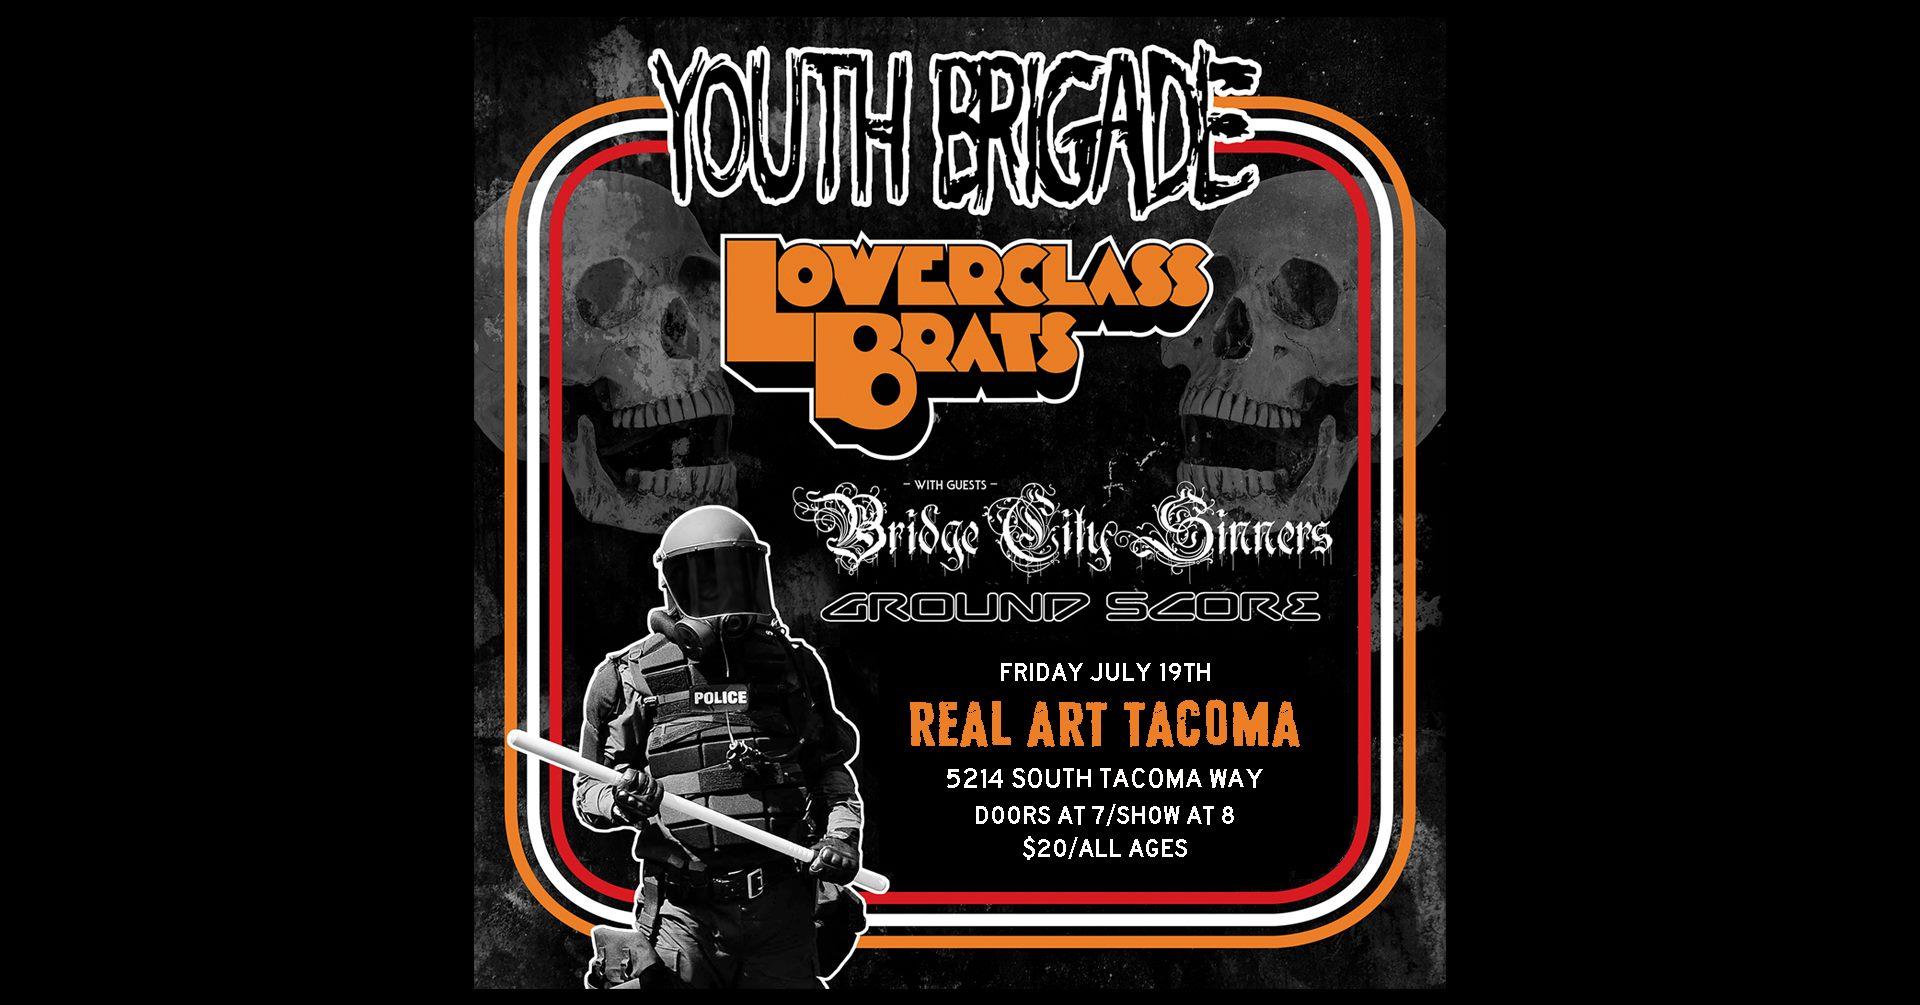 Youth Brigade.jpg